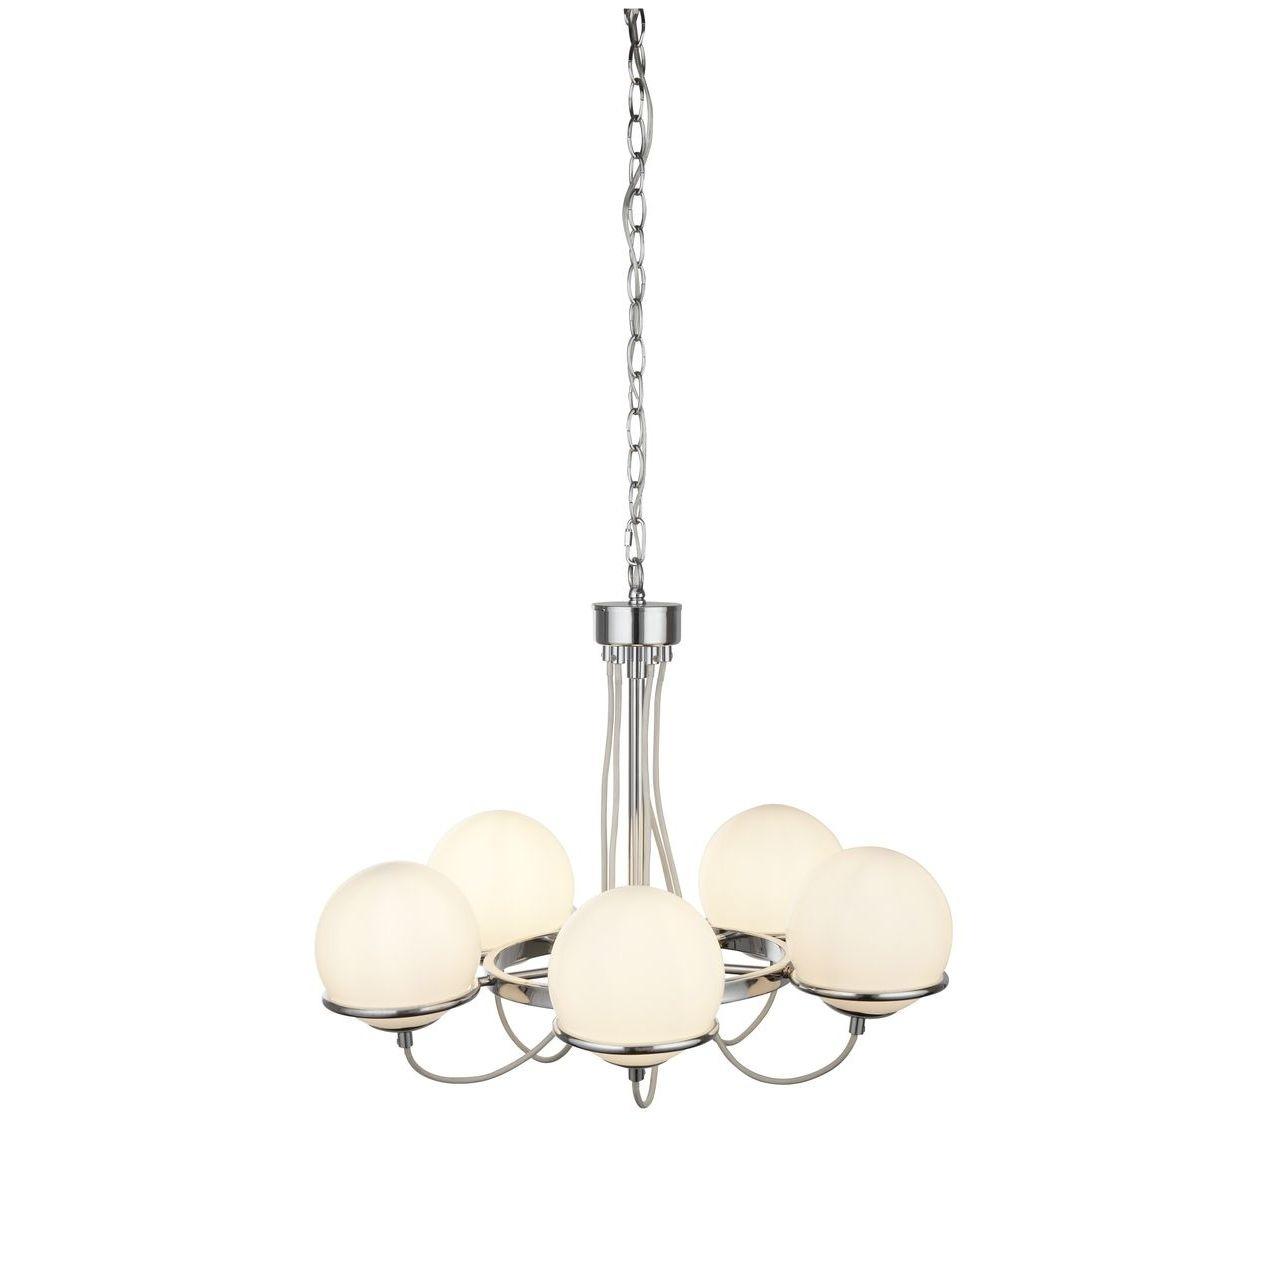 A2990LM-5CC Подвесная люстра Arte Lamp Bergamo